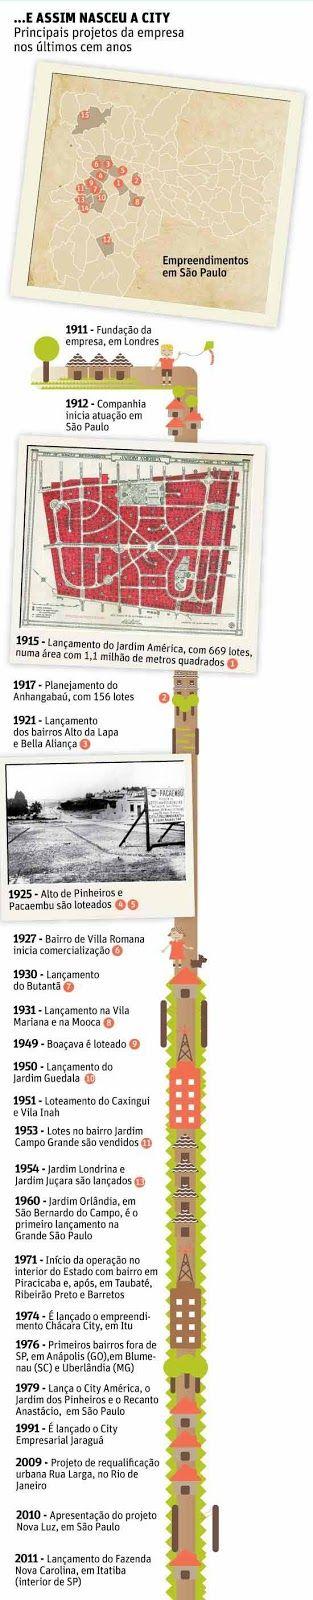 "Professor Wladimir - Geografia: ARTIGO sobre ""BAIRROS-JARDIM"" na cidade de SÃO PAULO http://1.bp.blogspot.com/-6wMX2Z6xcwY/UKBd4fMo7jI/AAAAAAAAByA/DZbhdcYTuKs/s1600/123141412.jpg"